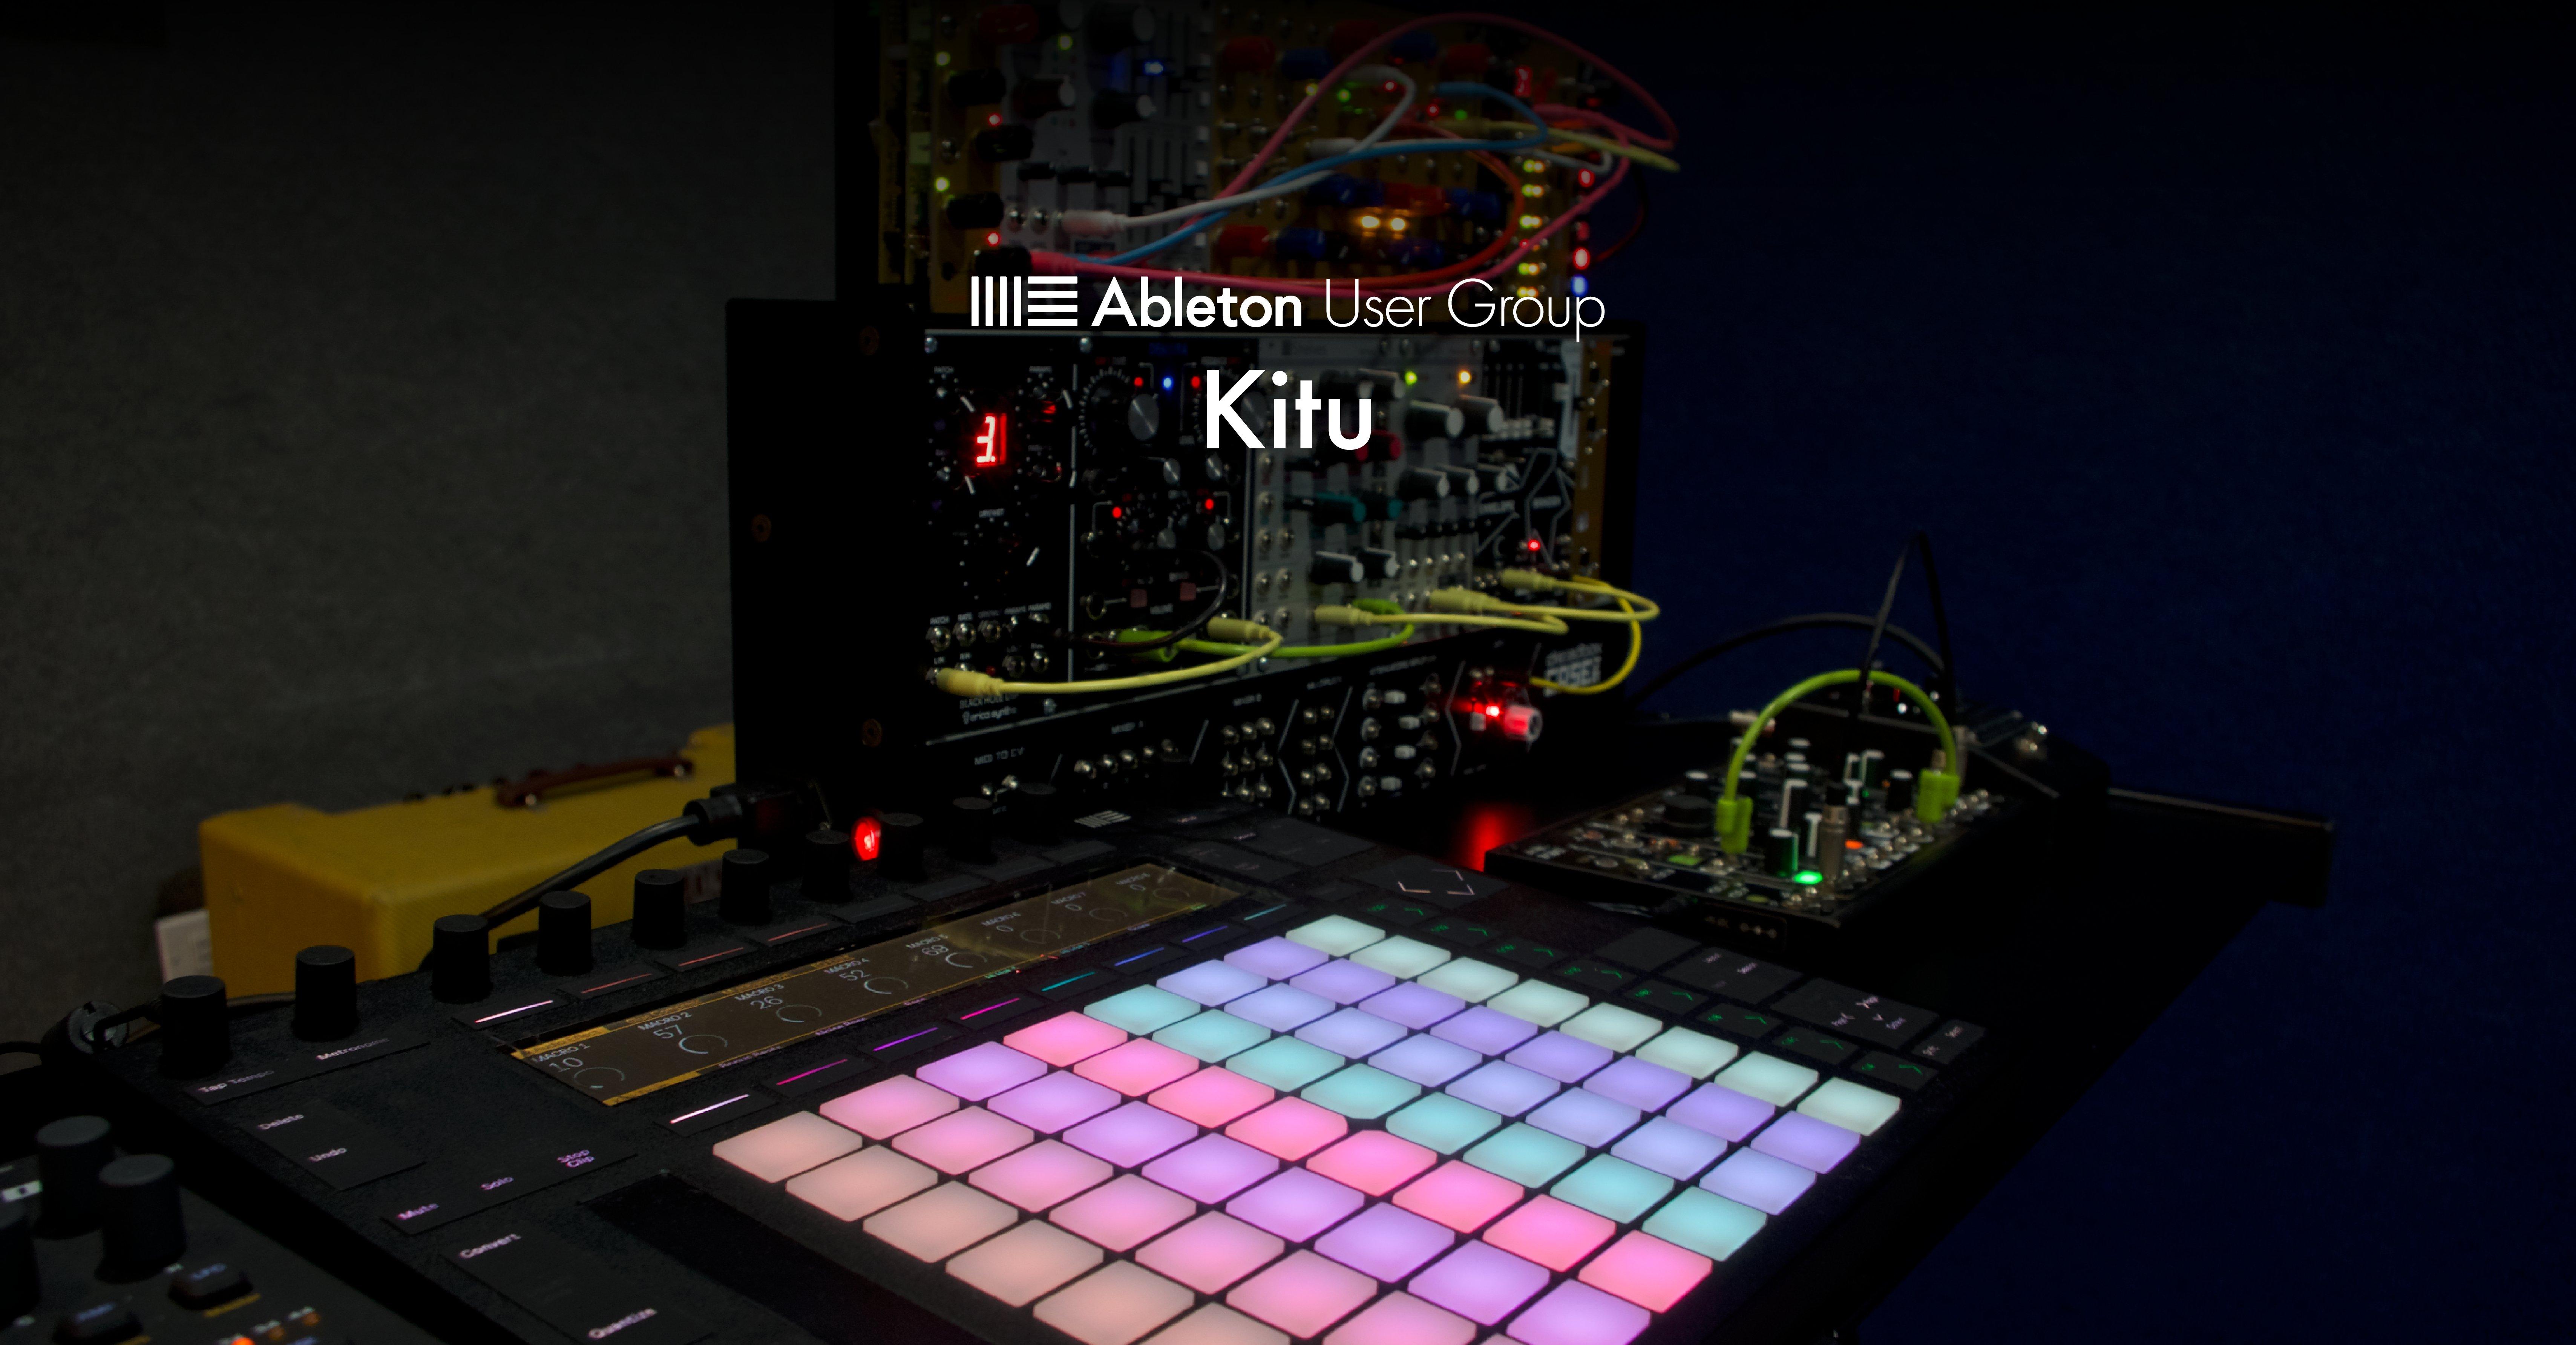 Kitu Ableton User Group Banner.png